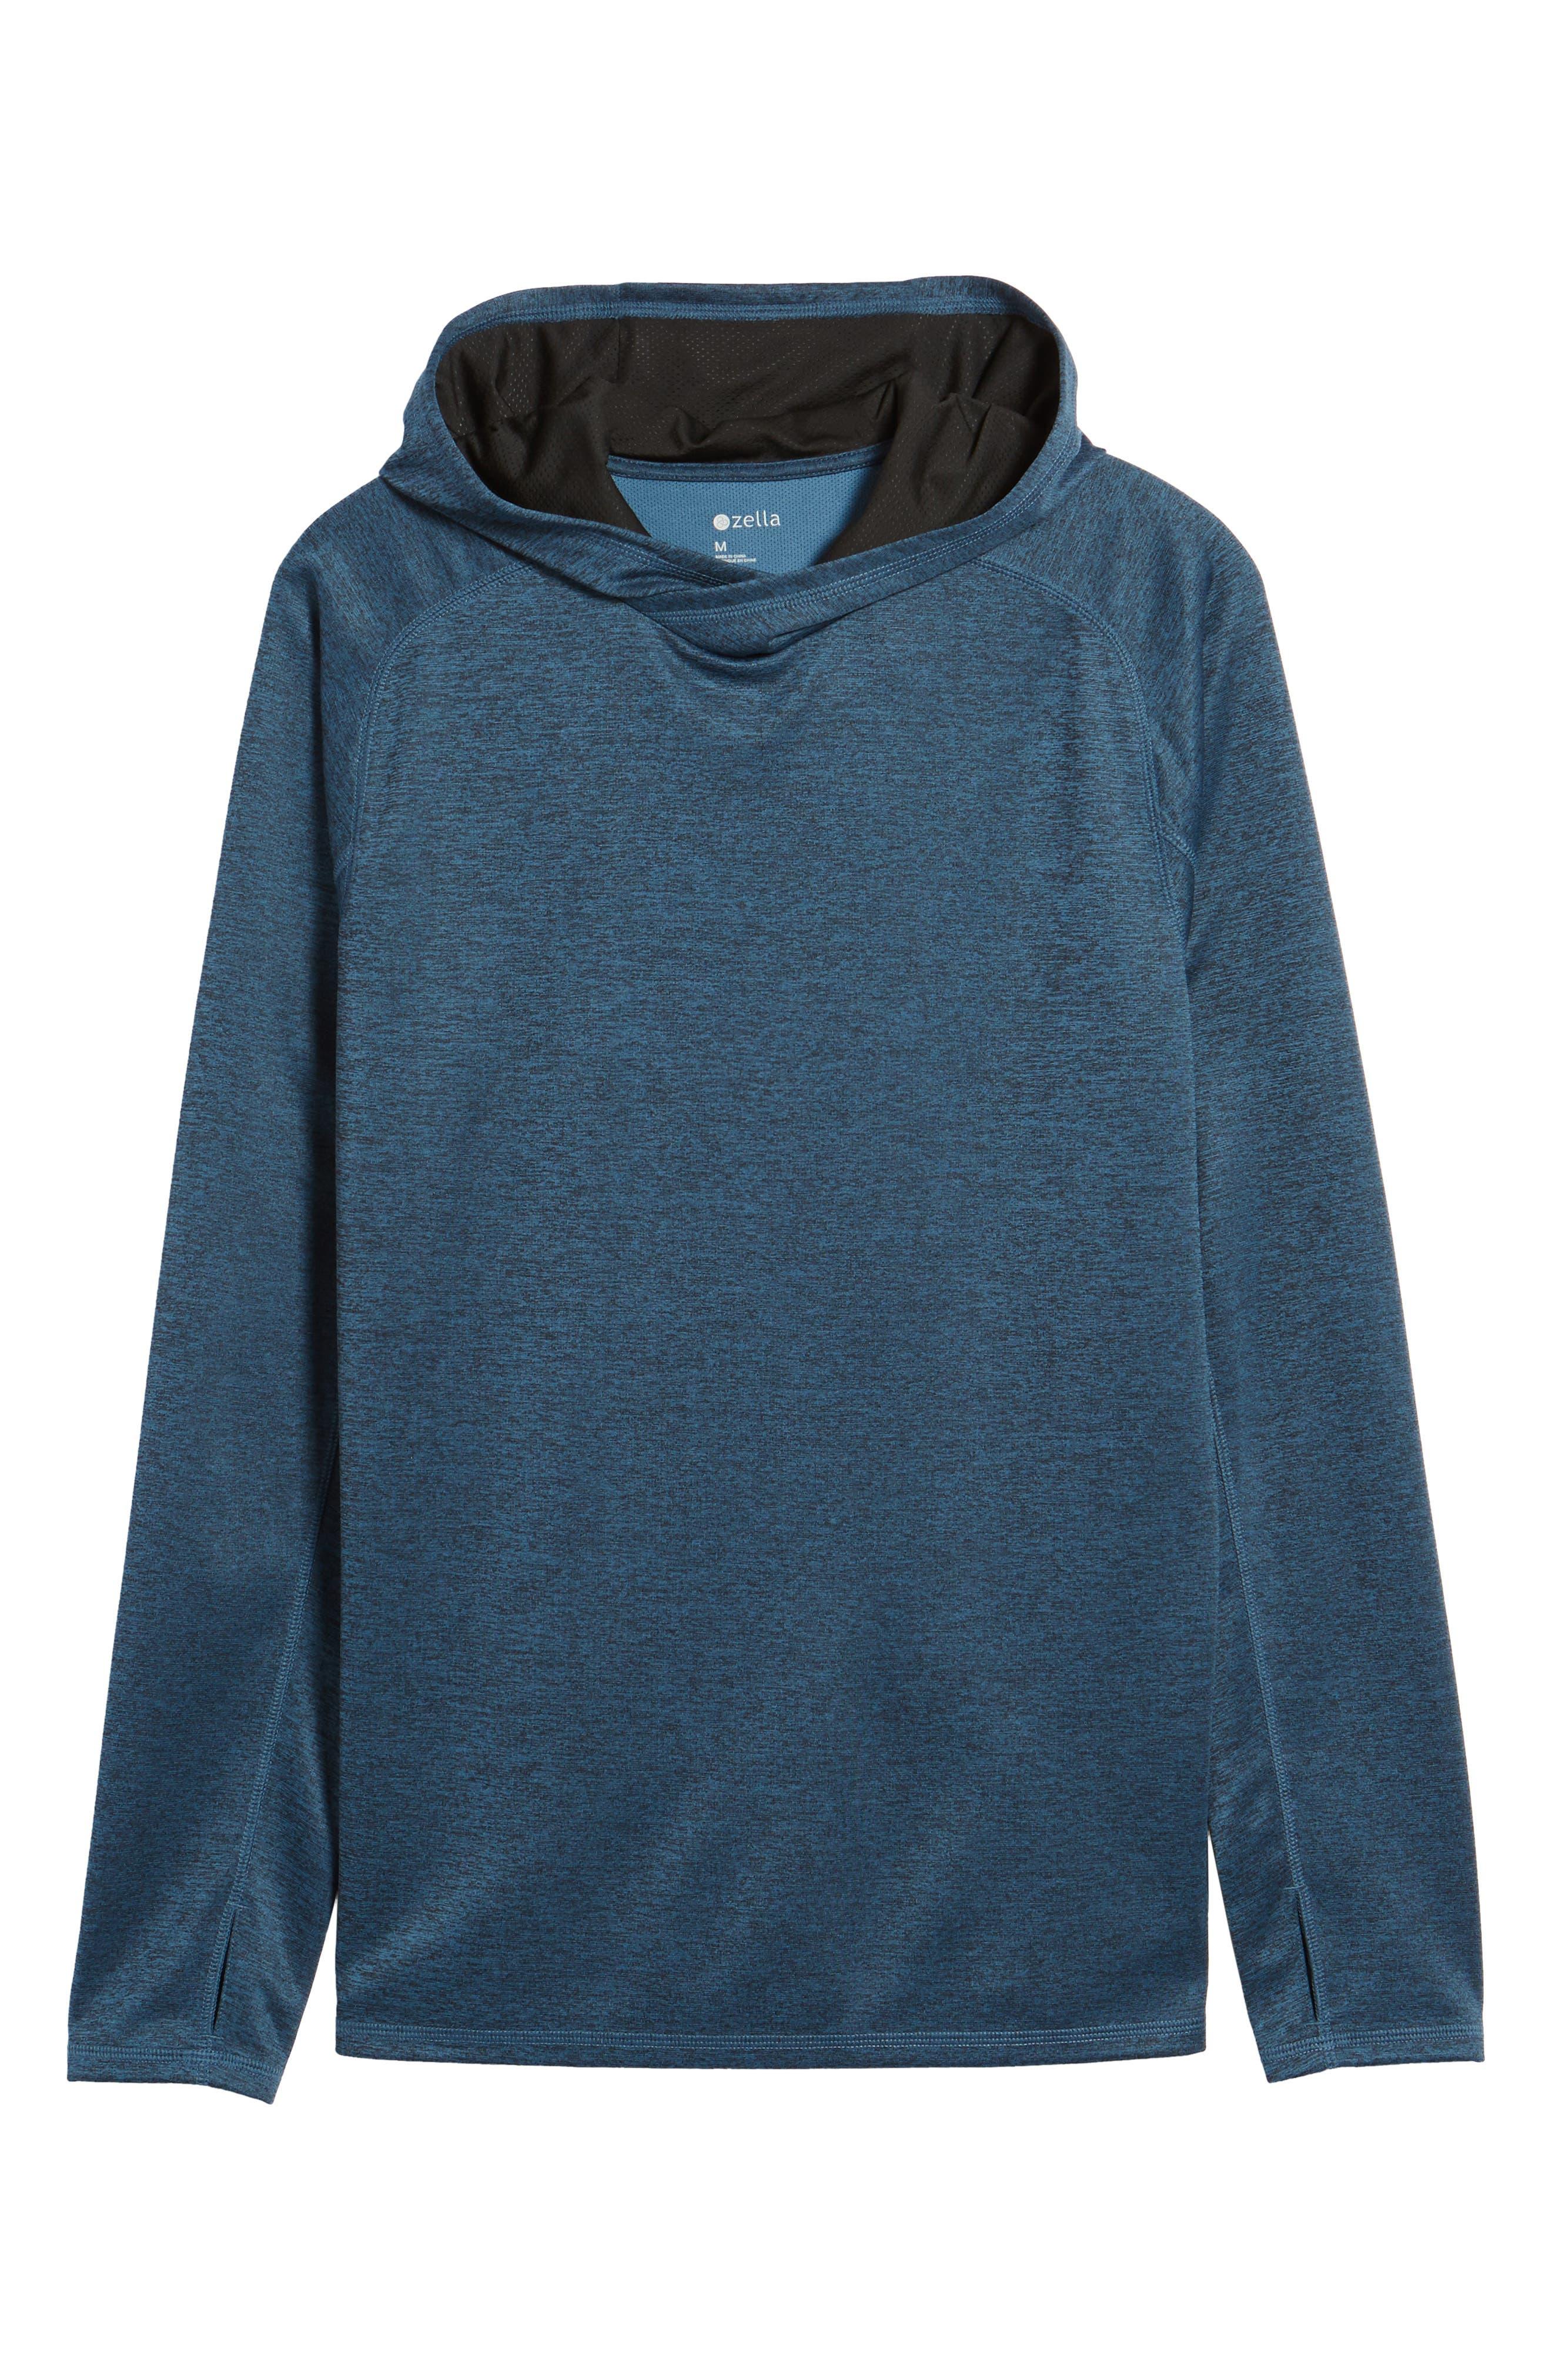 Lightweight Pullover Hoodie,                             Alternate thumbnail 6, color,                             Blue Chrome Melange